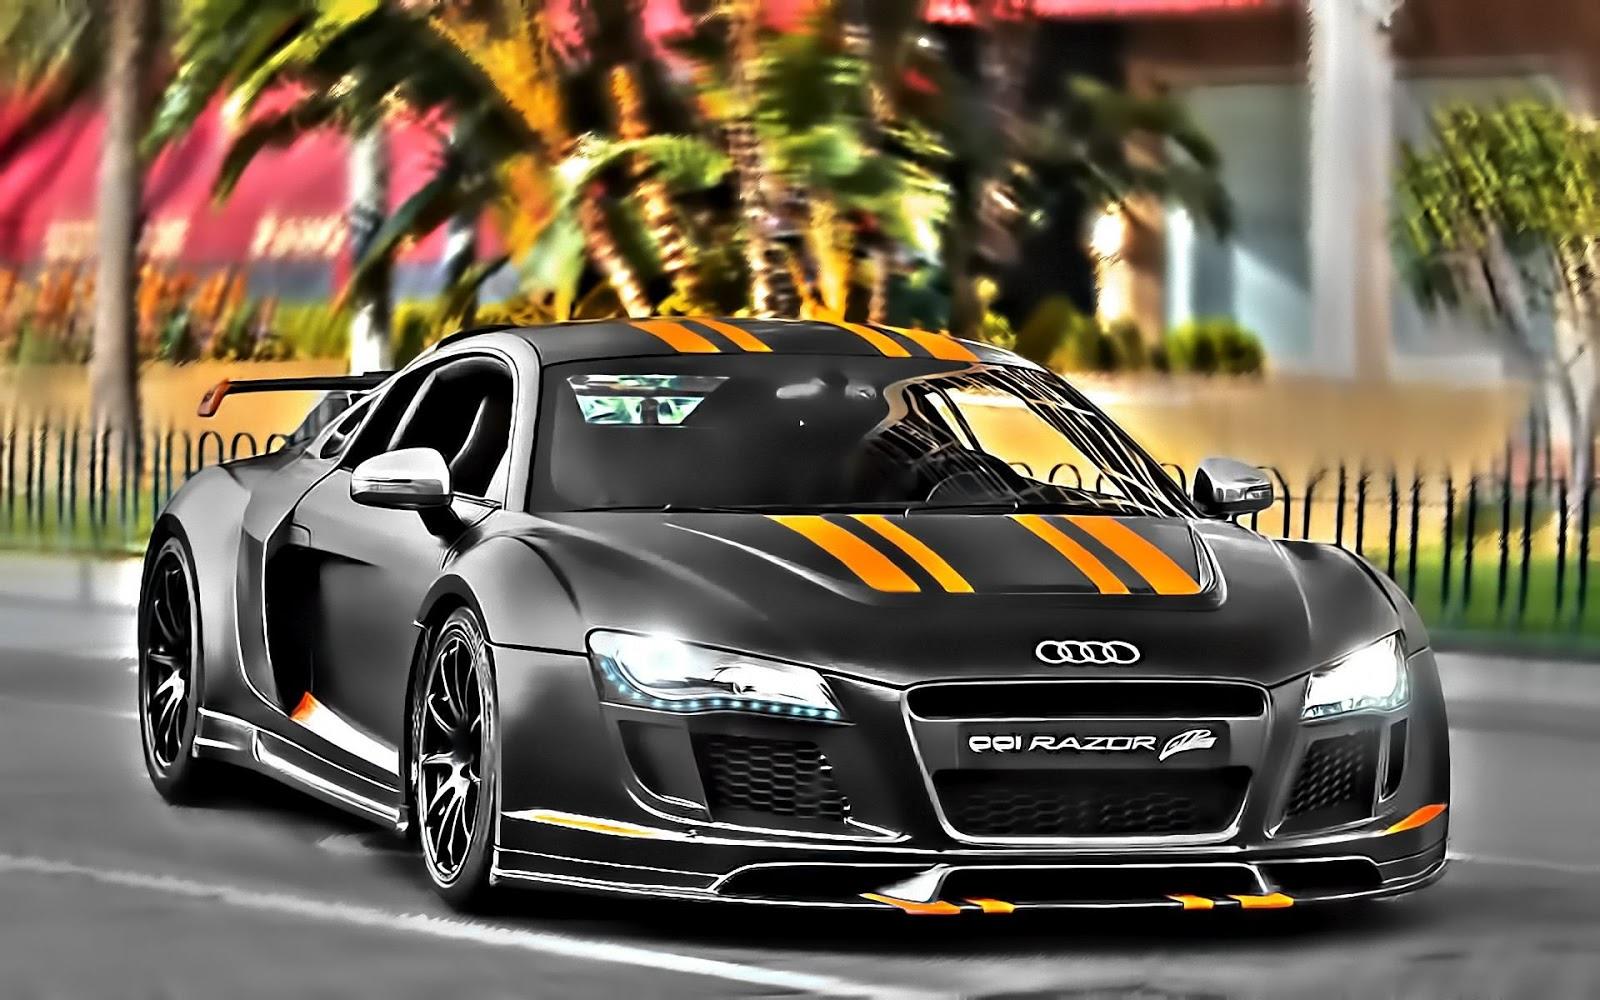 Audi QQI Razor